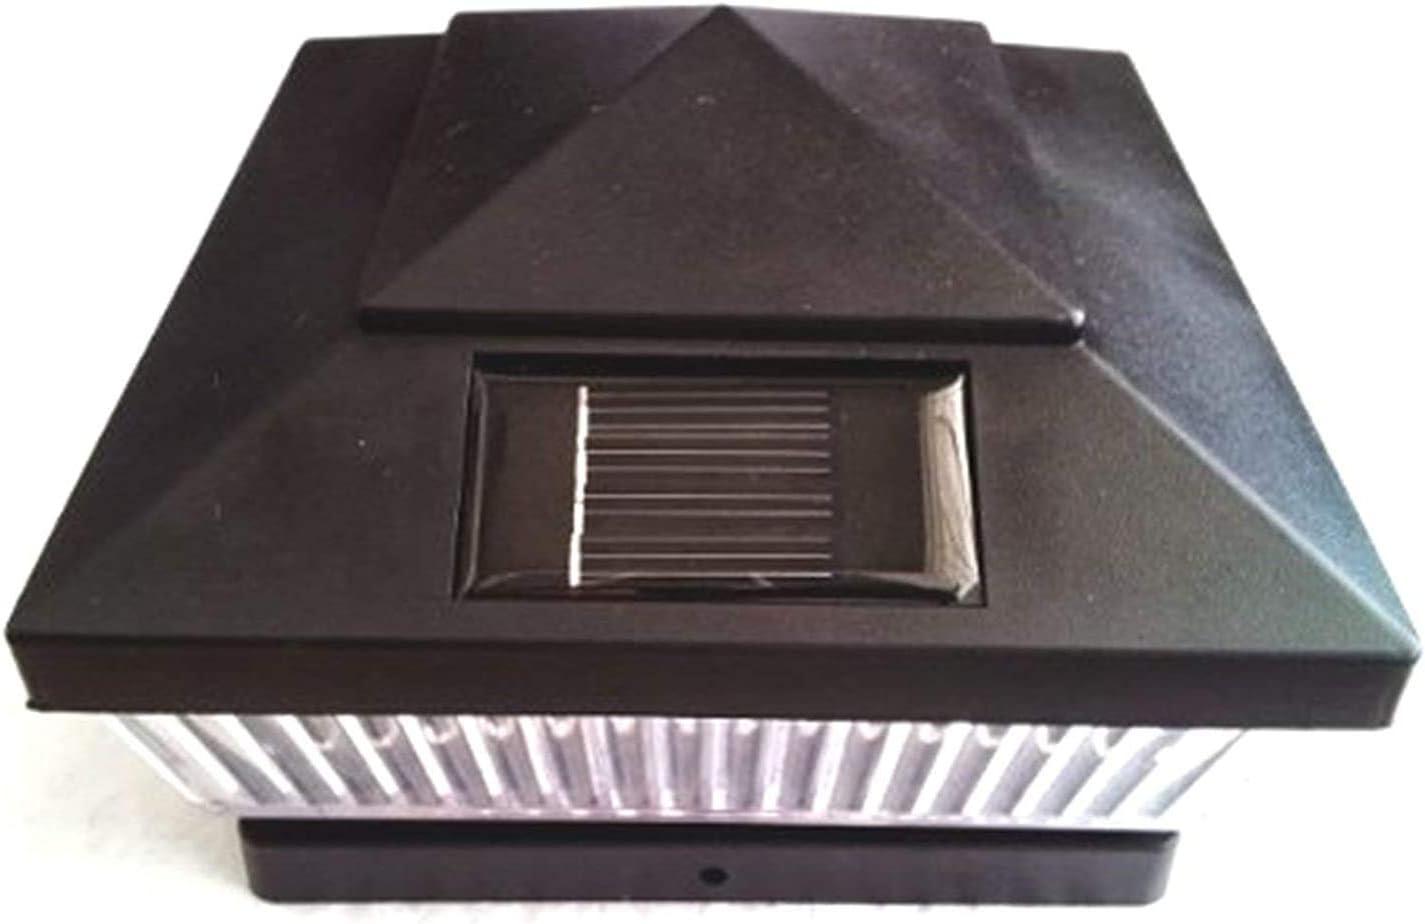 Classic Solar 5x5 ランキング総合1位 Powered Plastic 実物 LED F Patio Garden Square Deck